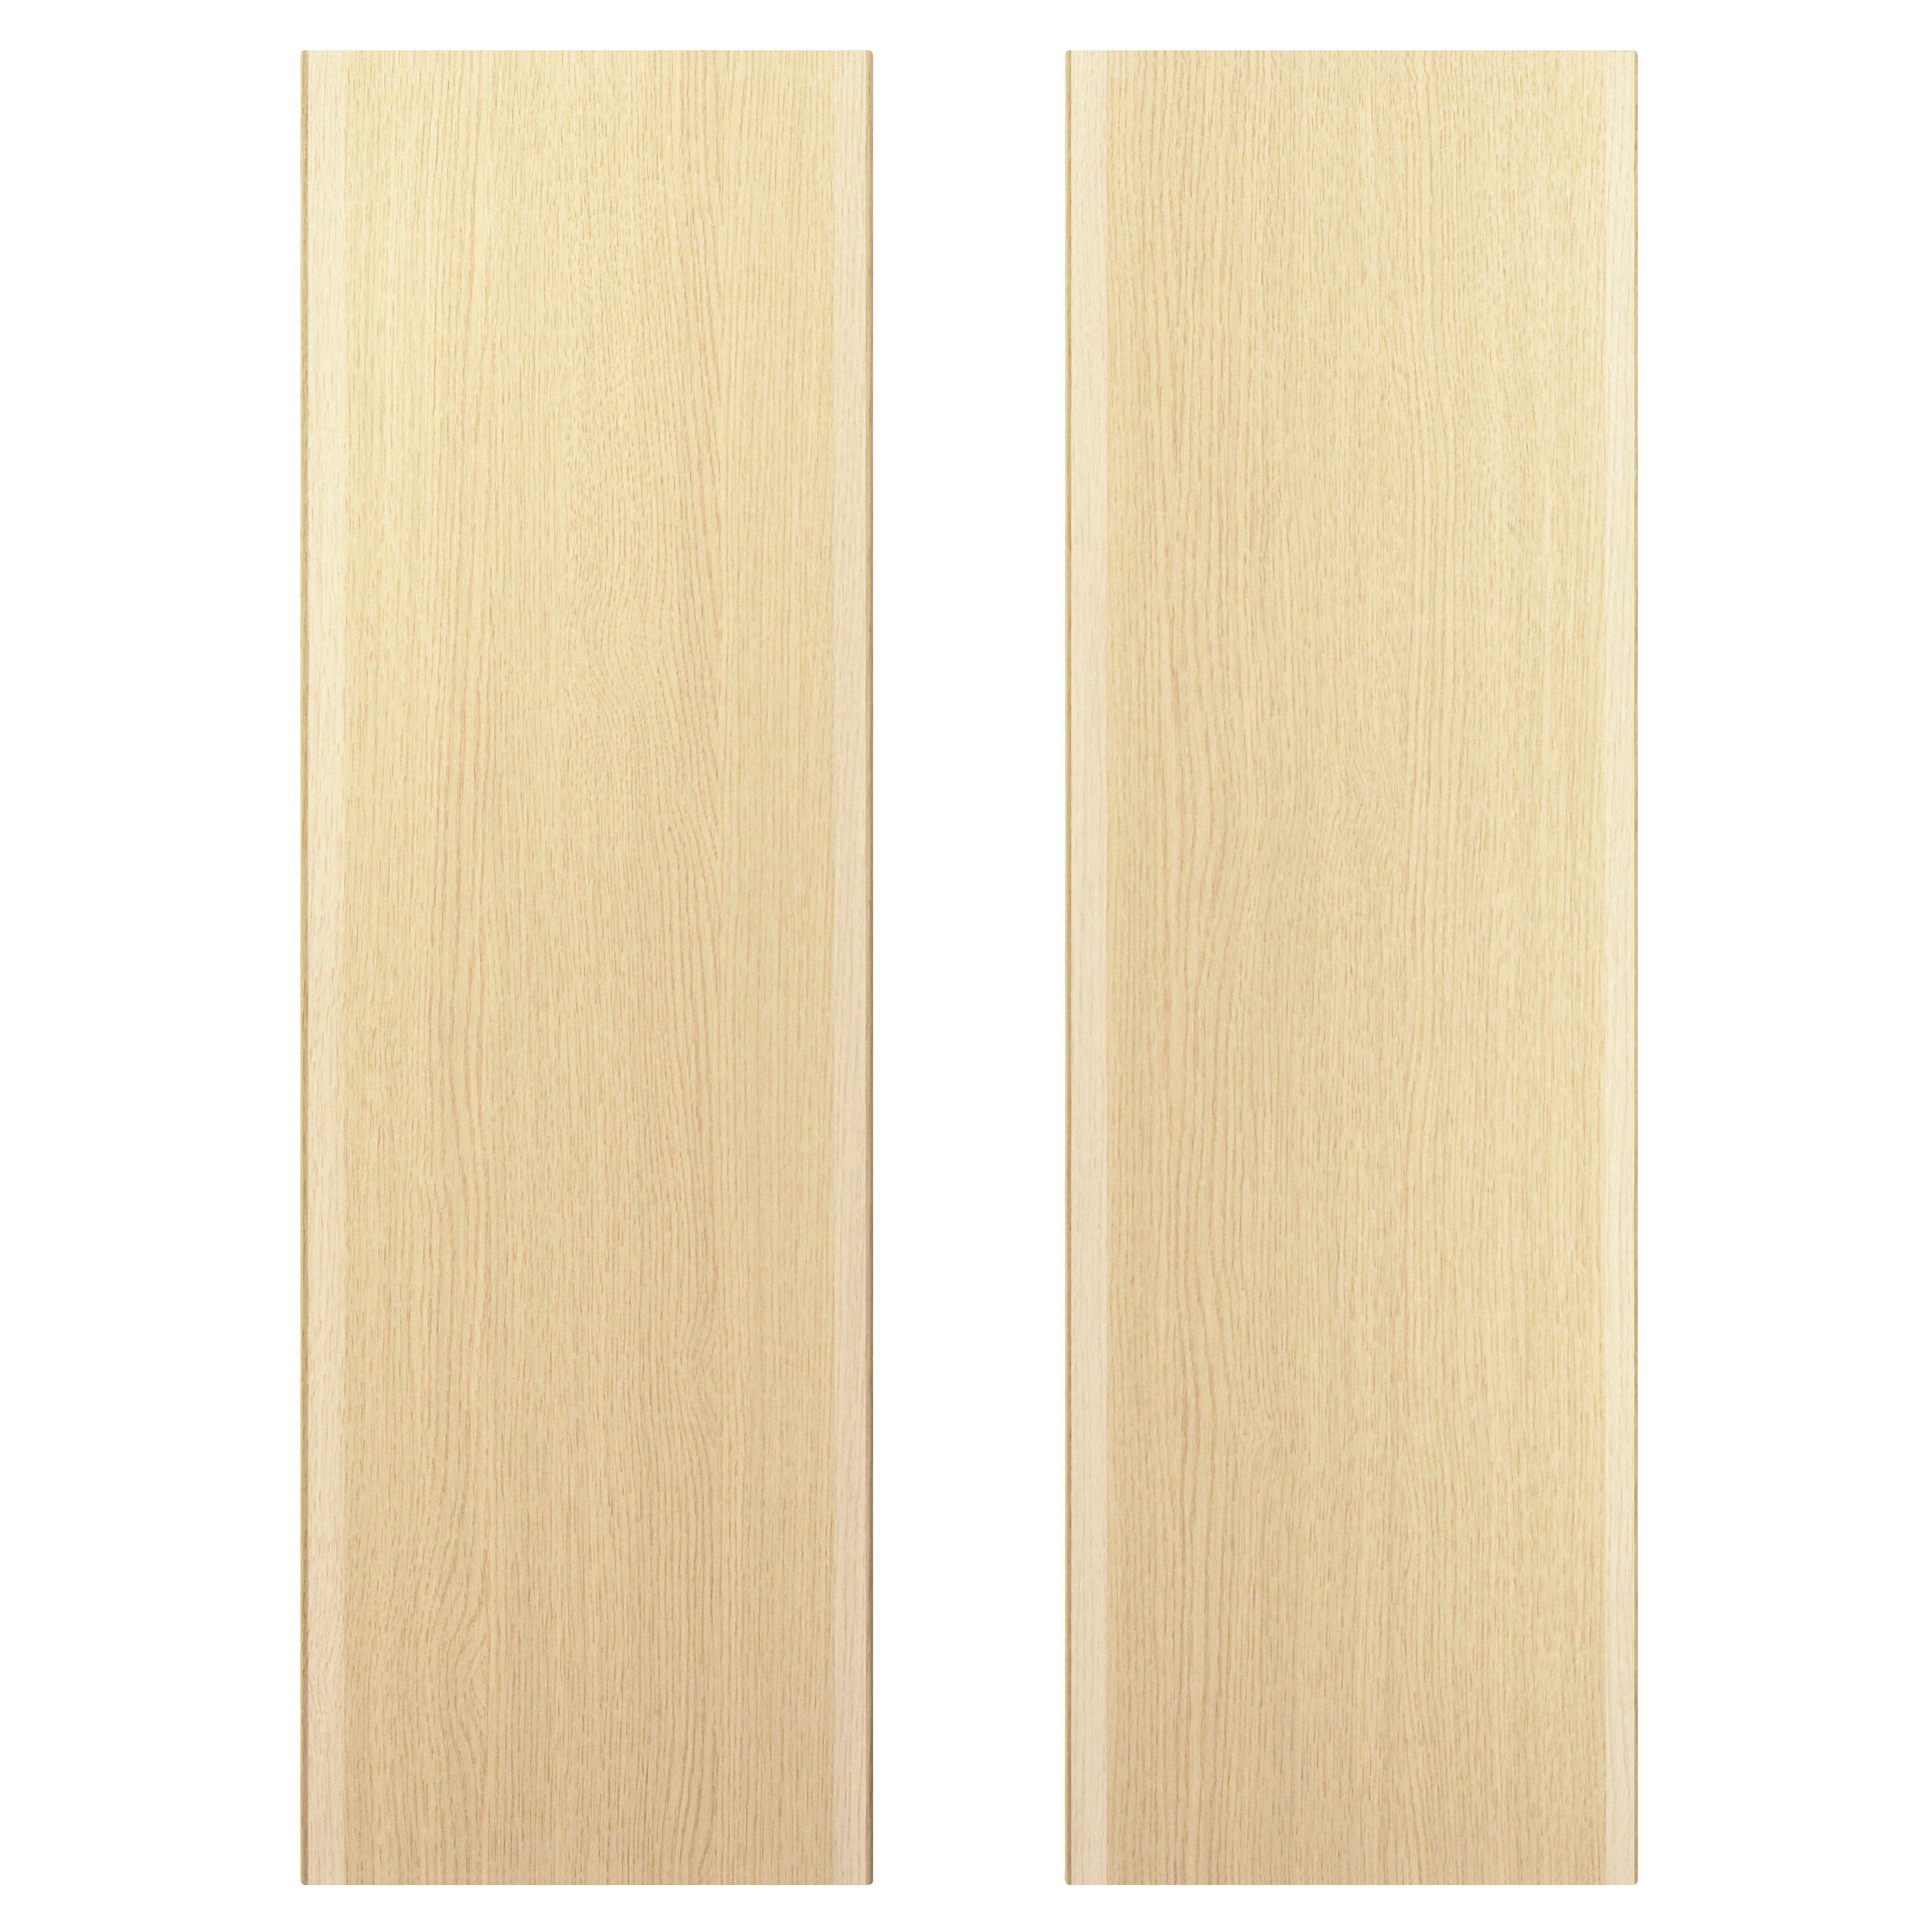 It Kitchens Sandford Textured Oak Effect Slab Larder Door (w)600mm, Set Of 2